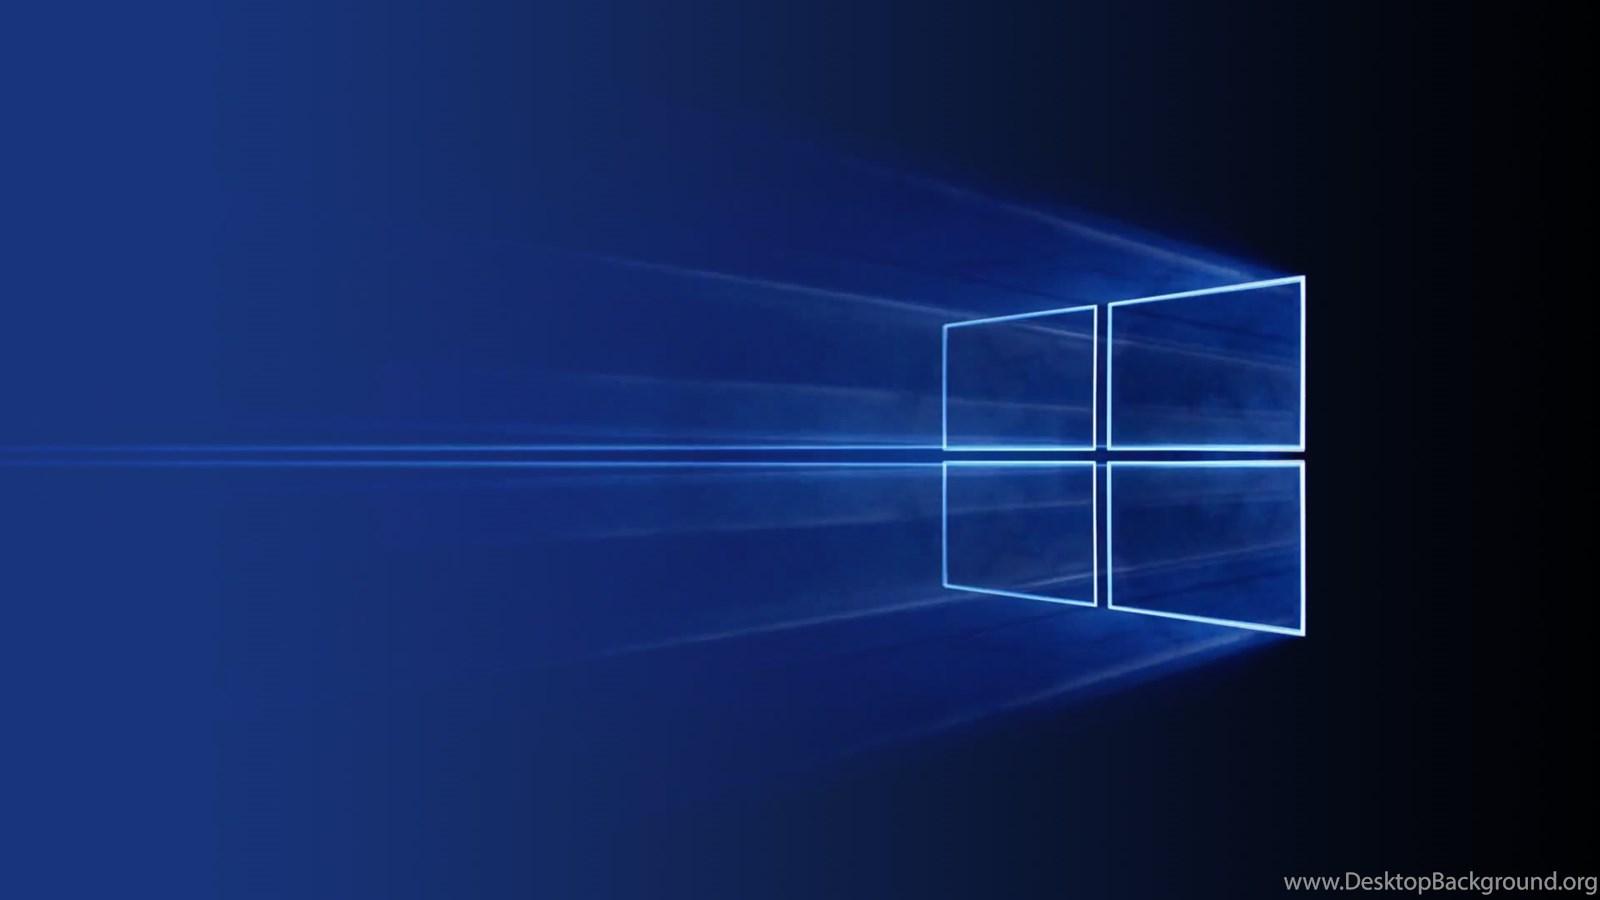 Pantsoff windows 10